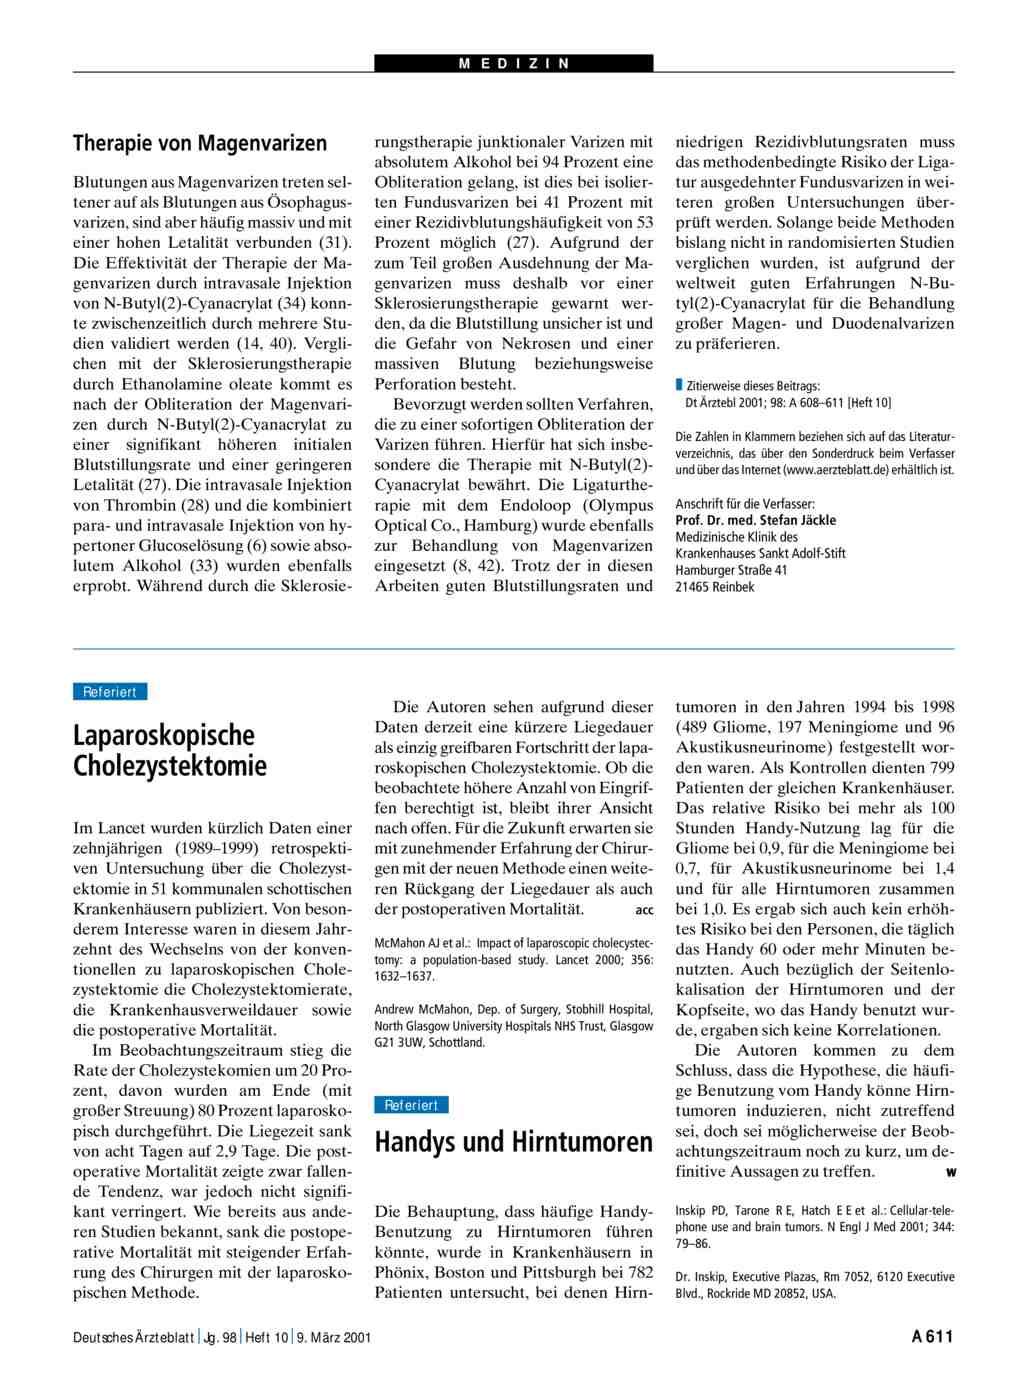 Laparoskopische Cholezystektomie postoperative Ernährung